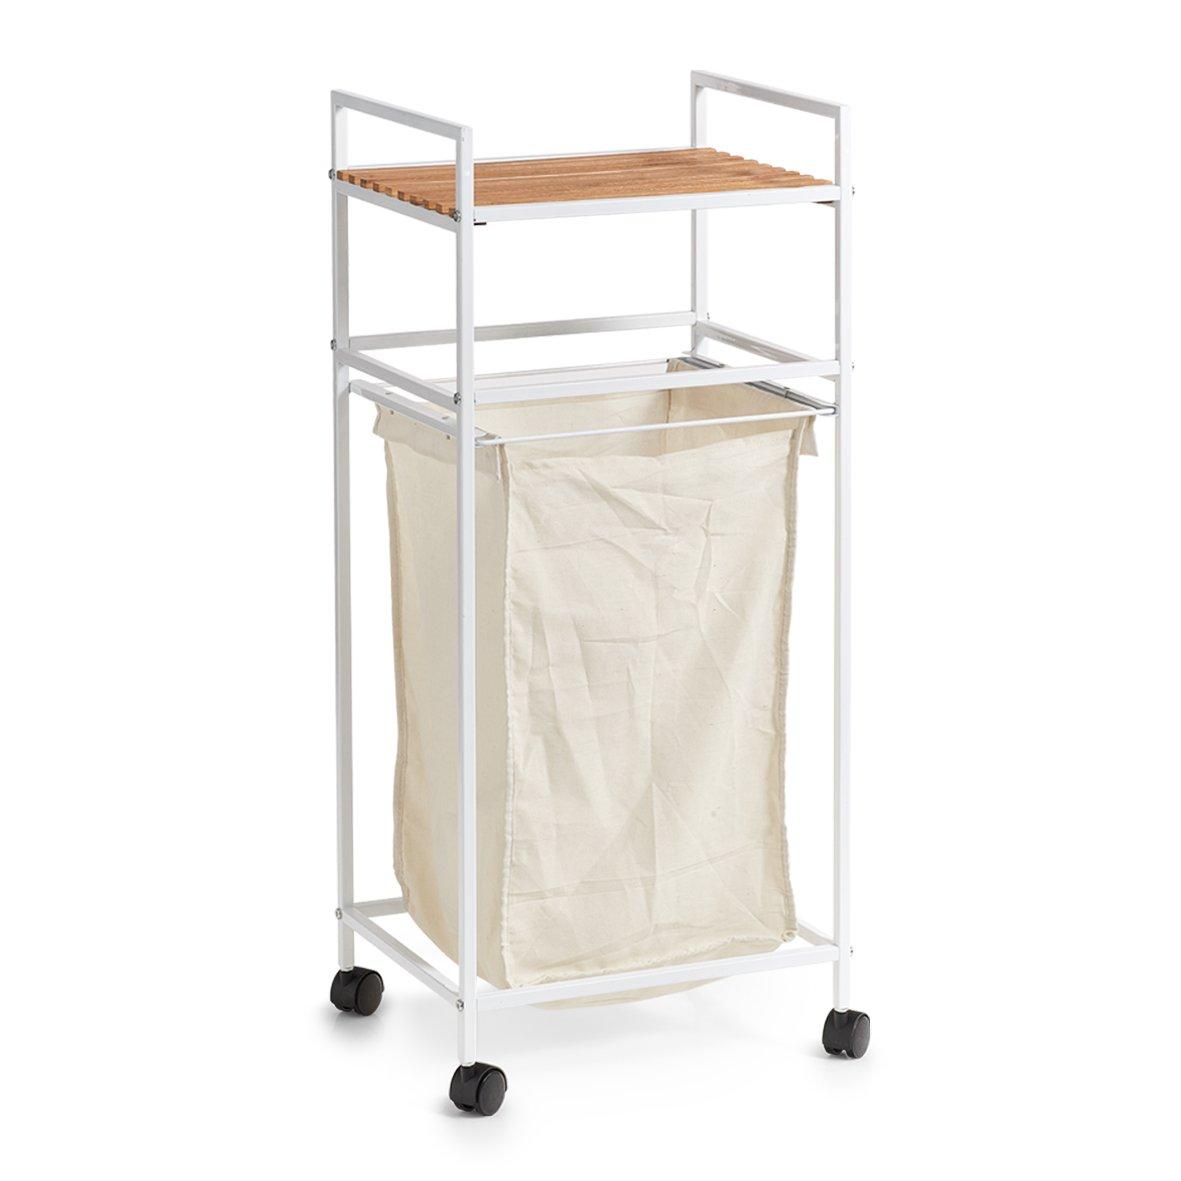 Zeller 18721Trolley Cart with Storage, Wood, white, 39x 32x 89.5cm